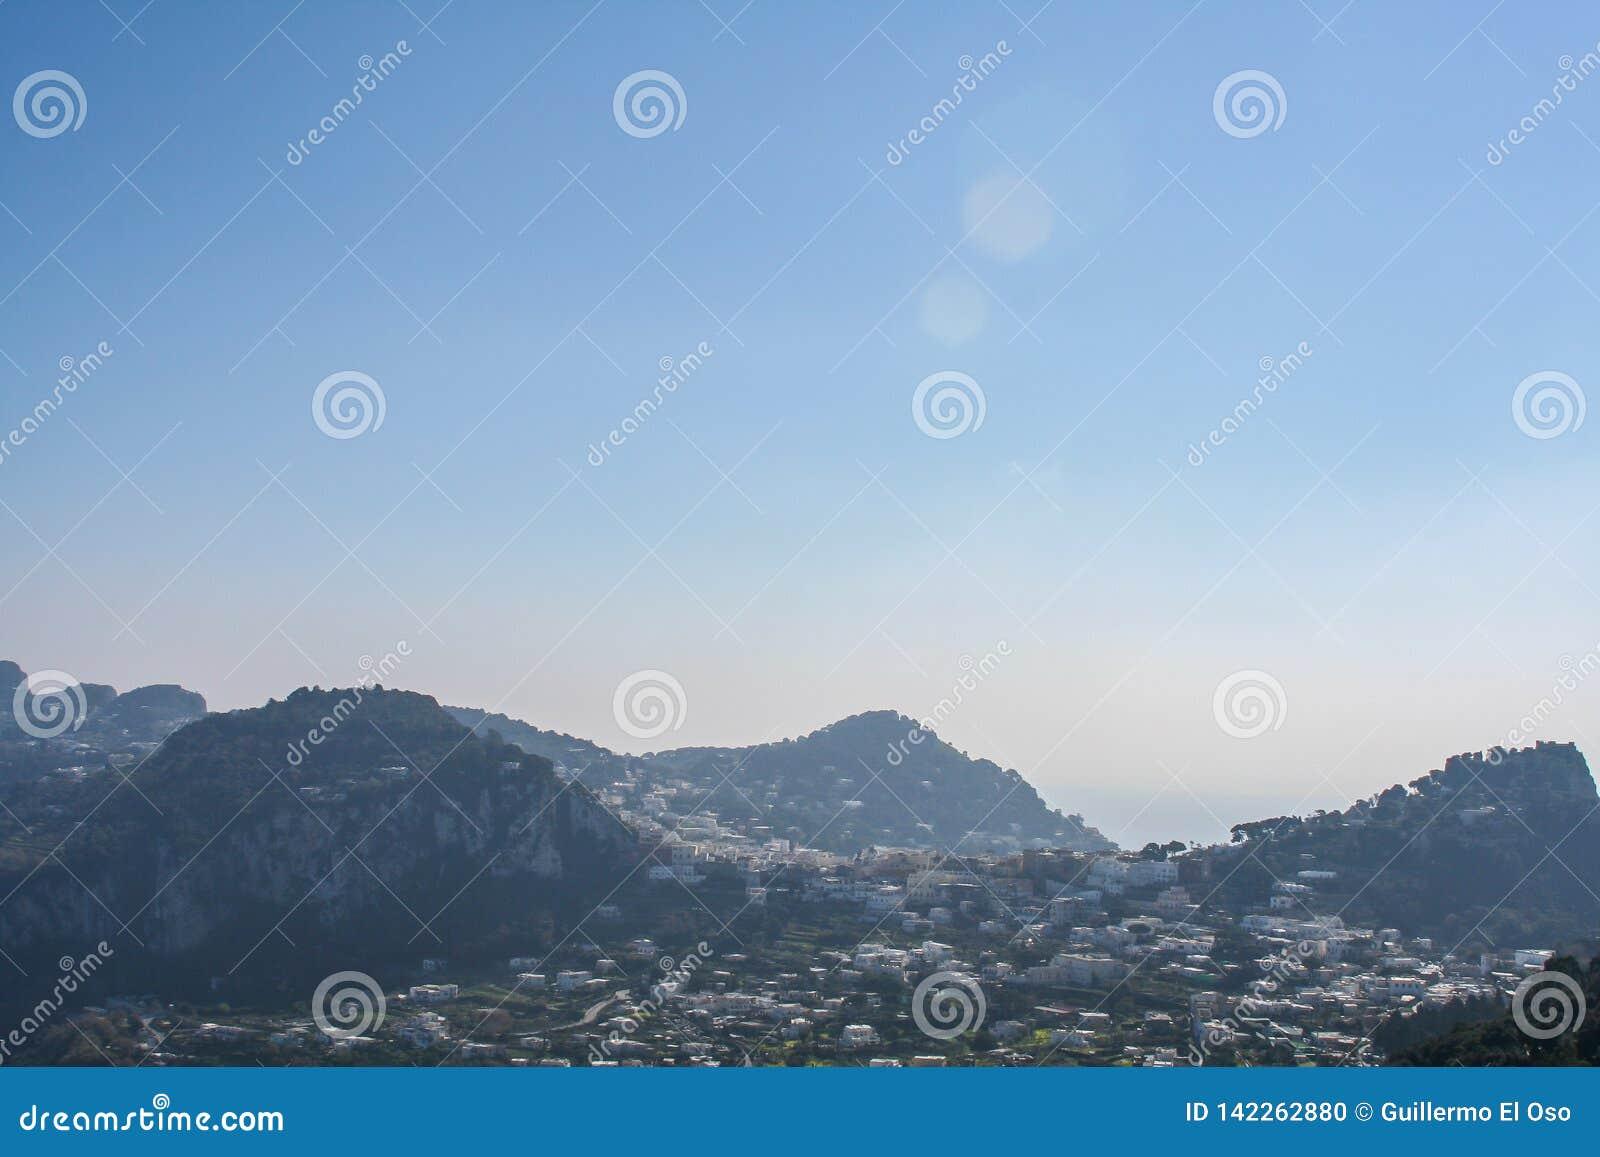 Duży widok nad górą Capri